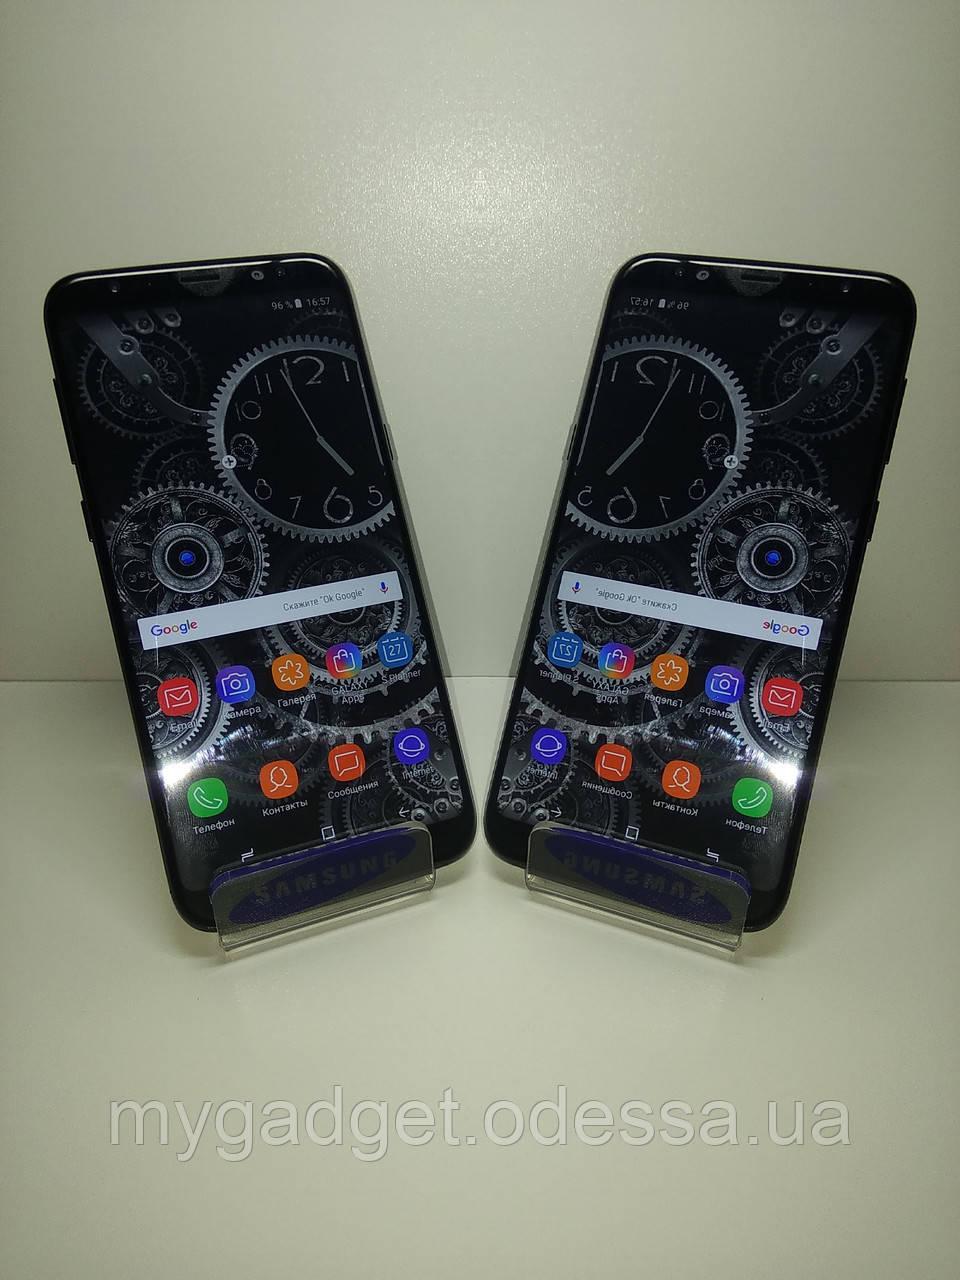 НОВИНКА! Точная копия Samsung Galaxy S9 Plus 64GB 8 ЯДЕР